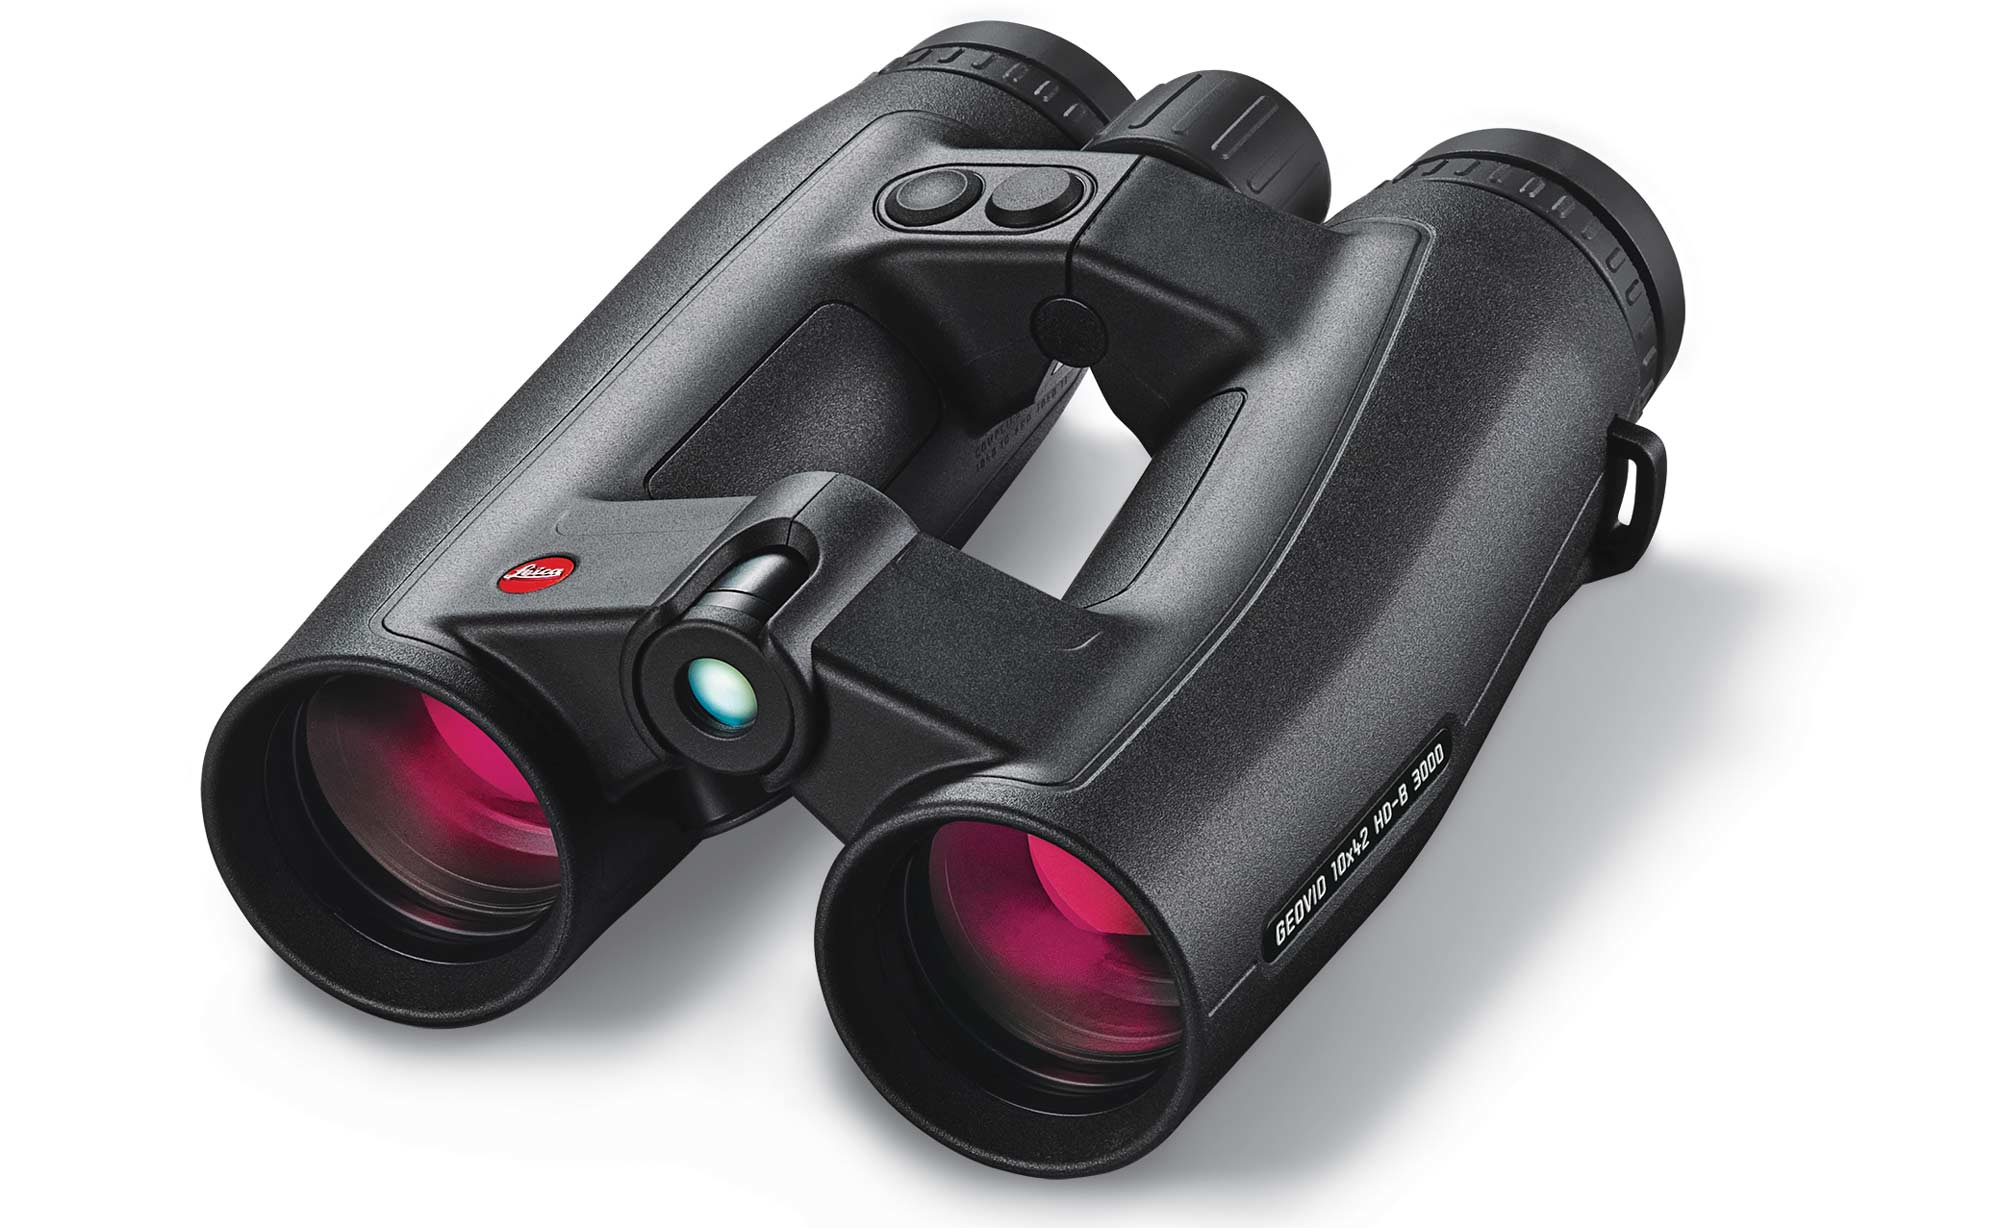 Leica Geovid HD-B 3000 10X42 Binocular